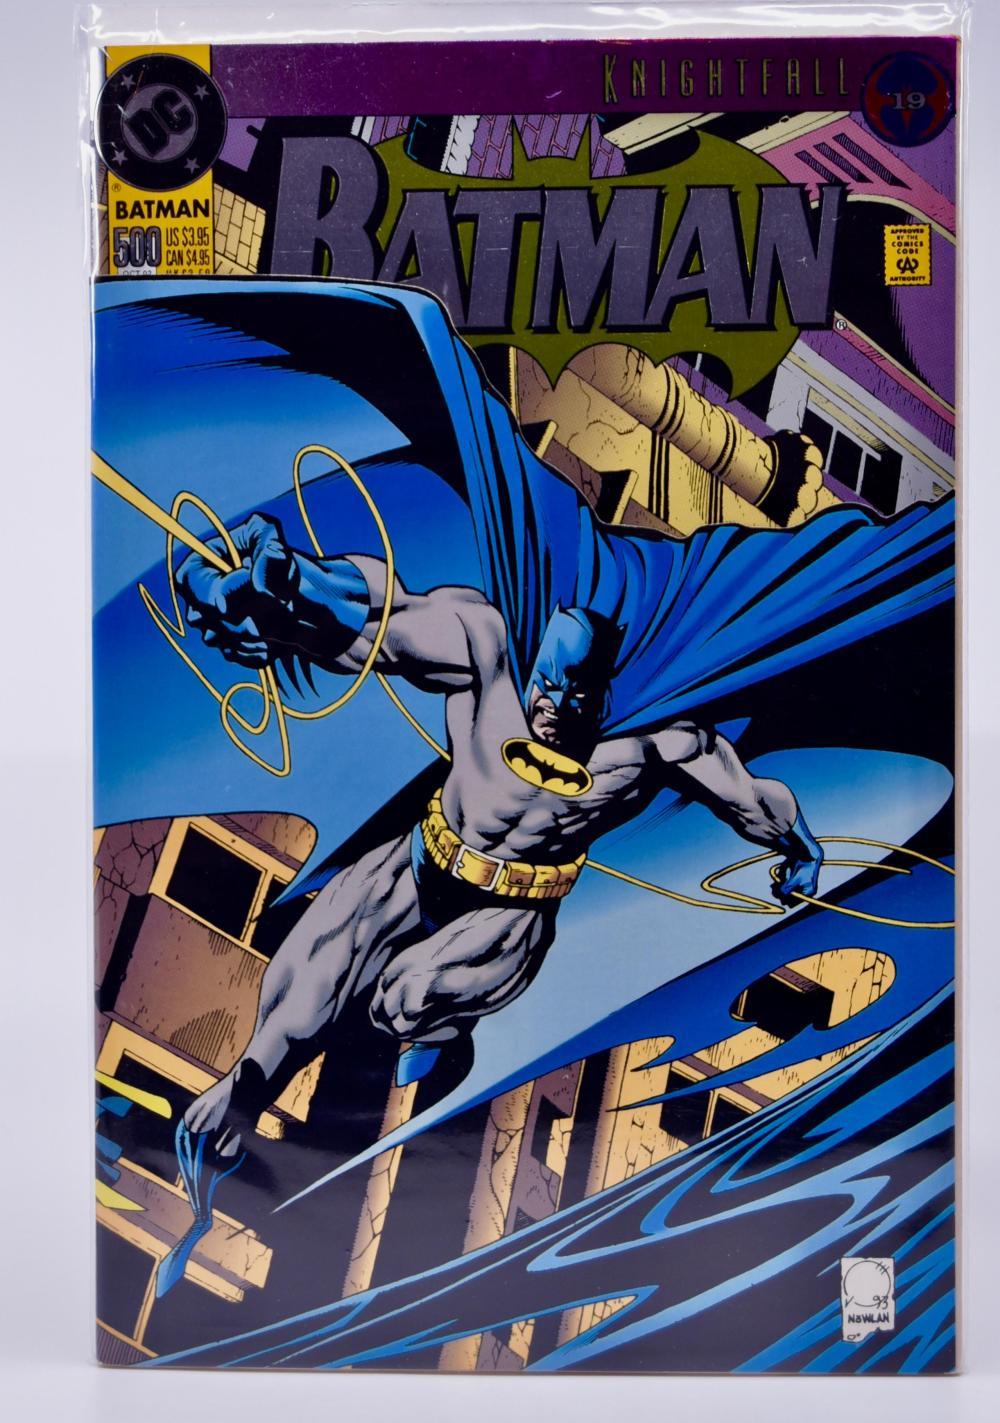 9   DC Comics   Batman  Knightfall   Issue 9   Foil Cover   Dark  Angel The Fall   Collectible